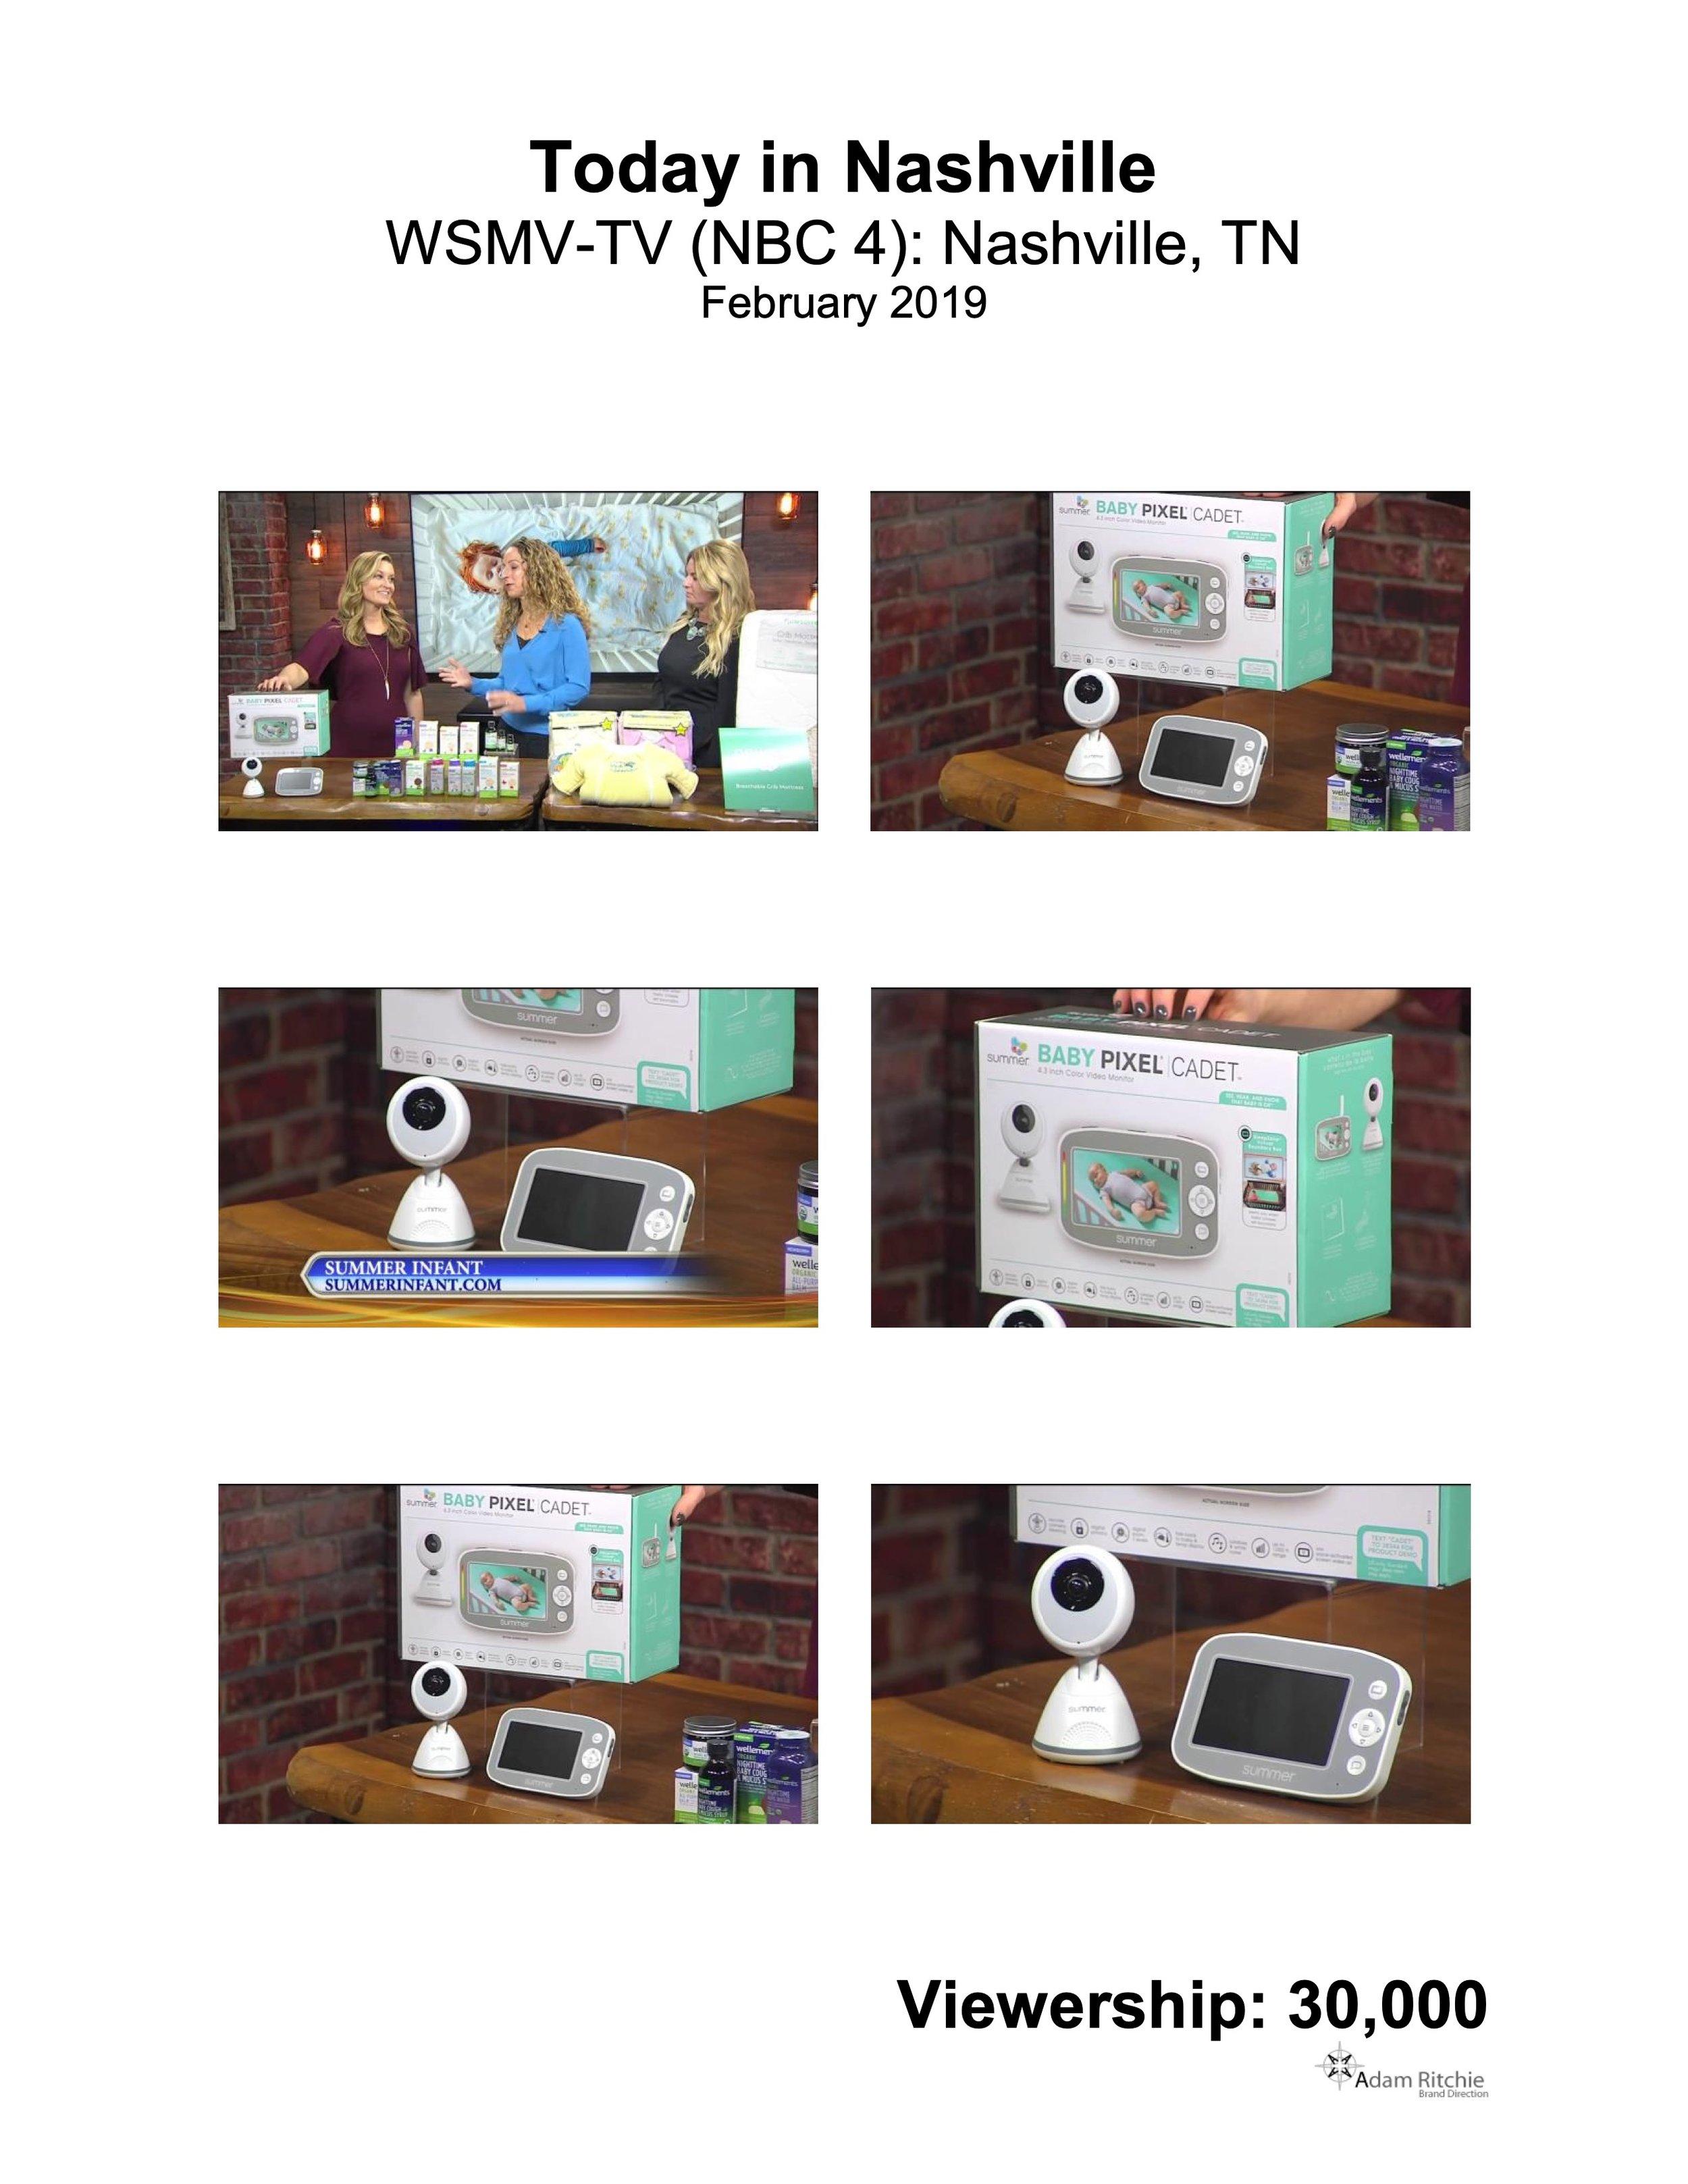 2019.02.11_WSMV-TV (NBC 4) Nashville Online, Today in Nashville_Summer Infant Baby Pixel Cadet Video Monitor.jpeg